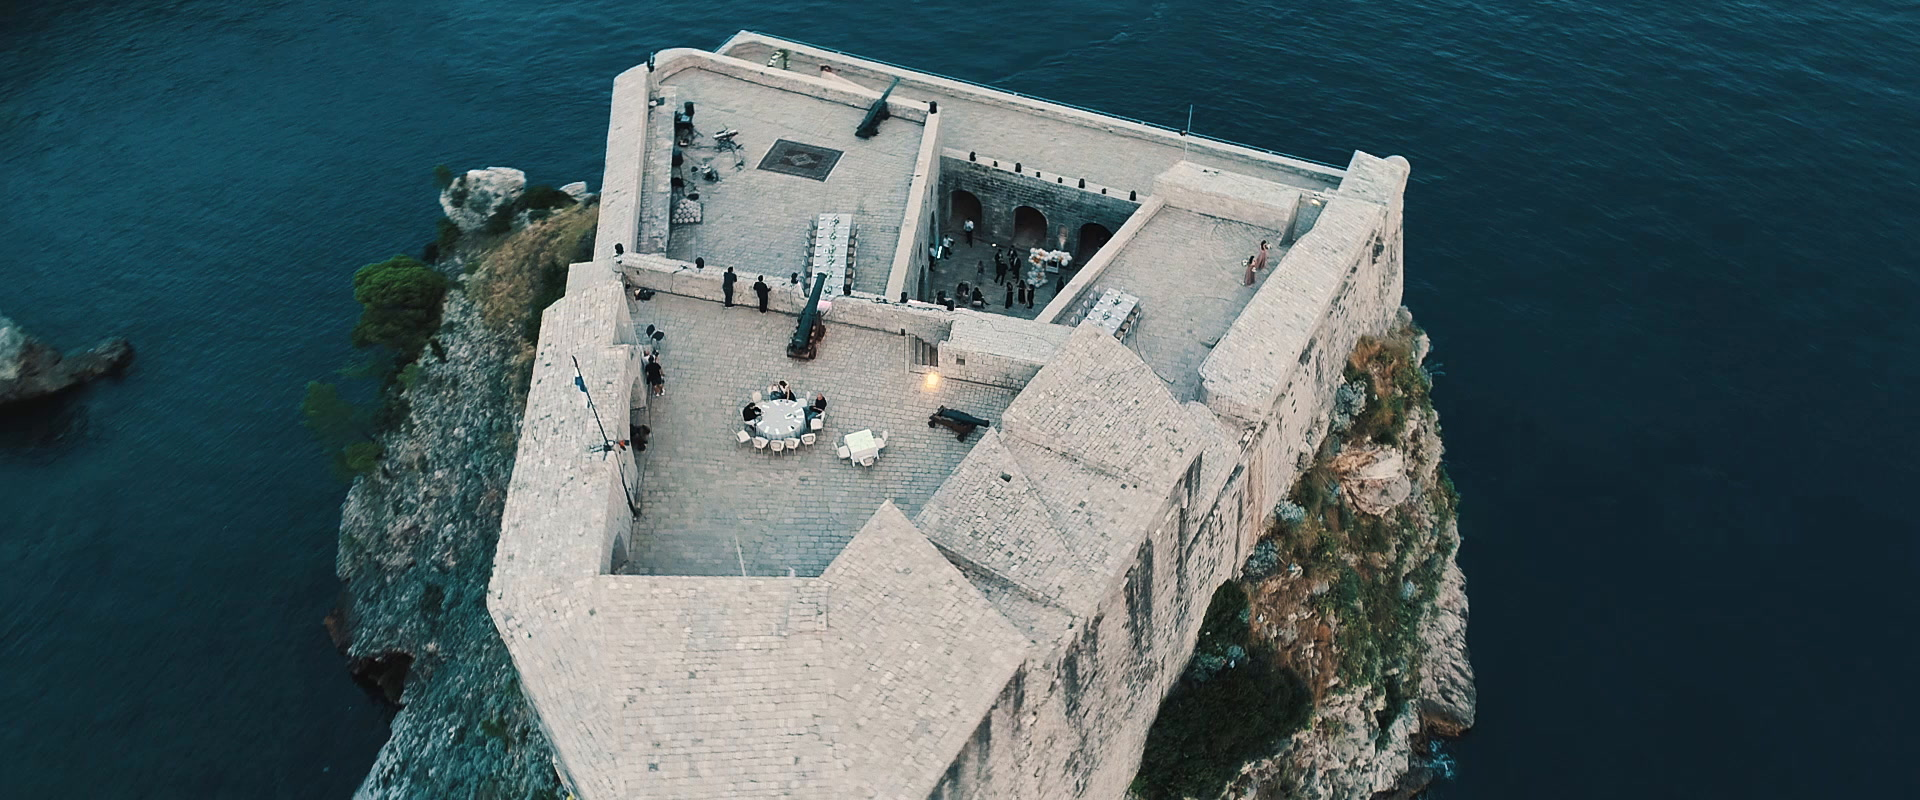 Sarine + Felix | Dubrovnik, Croatia | St. Lawrence fort